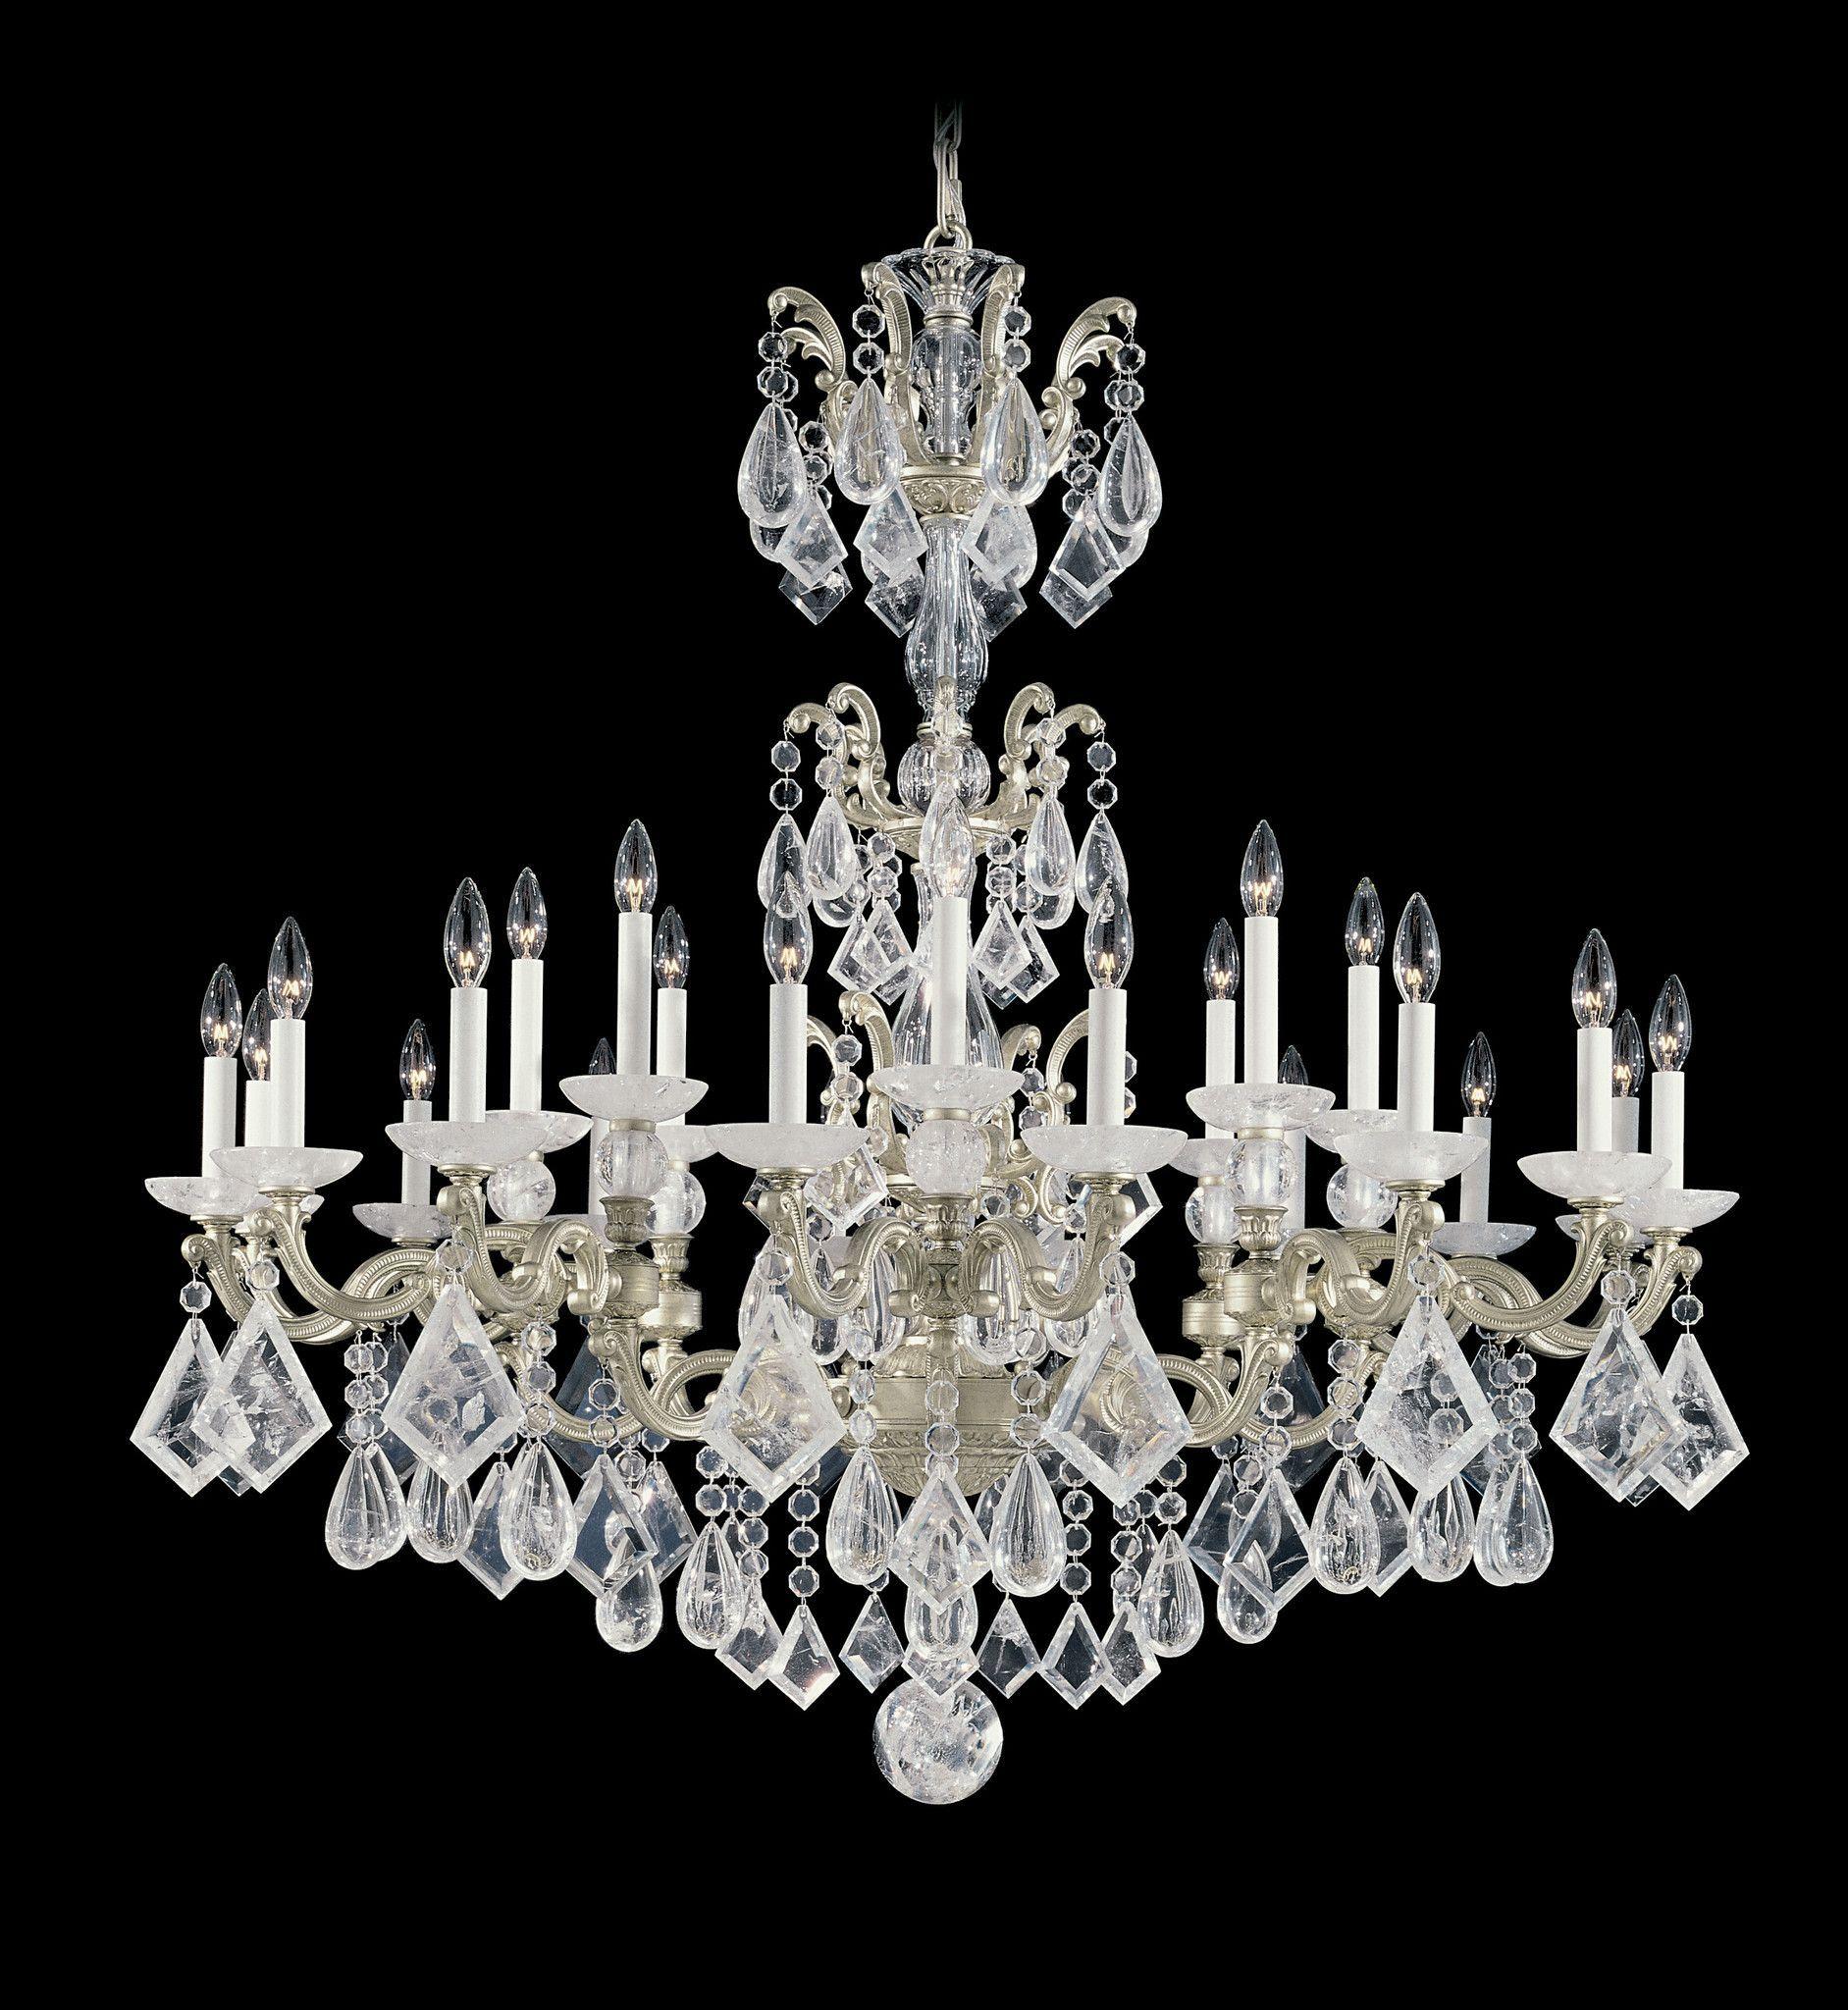 Schonbek 5413 la scala rock crystal 46 inch chandelier lighting schonbek 5413 la scala rock crystal 46 inch chandelier aloadofball Image collections